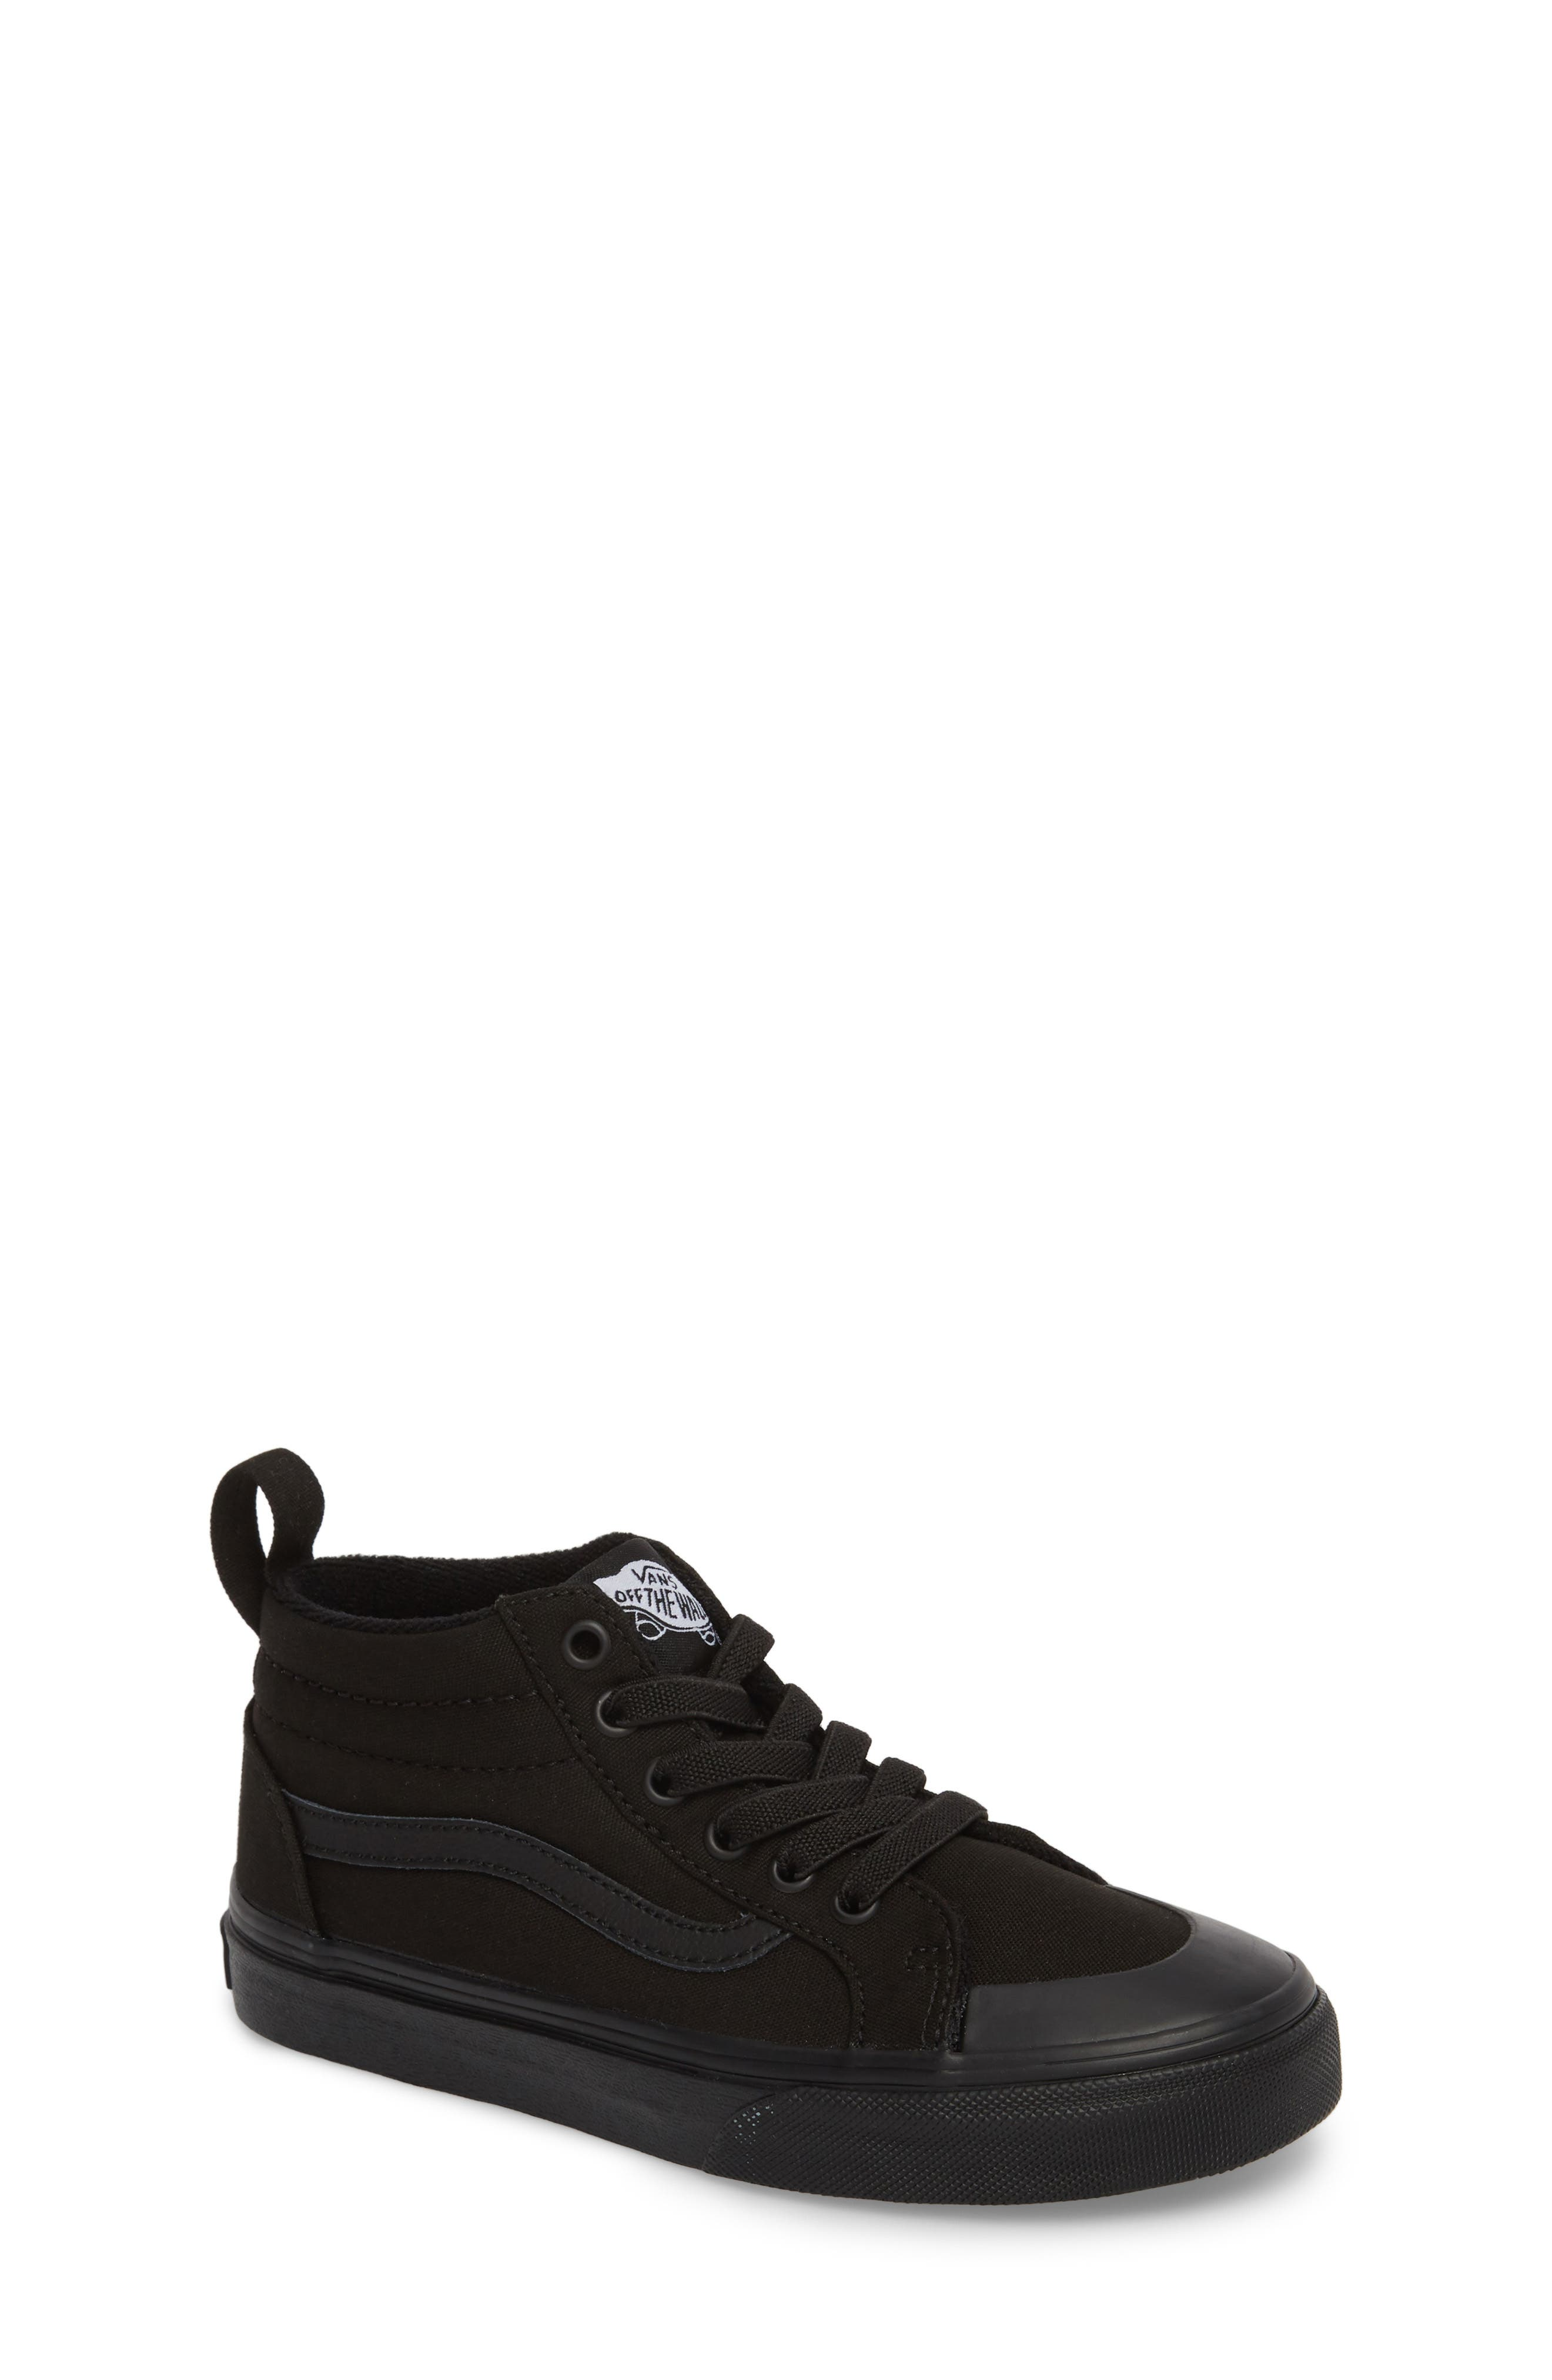 Racer Mid Elastic Lace Sneaker,                             Main thumbnail 1, color,                             BLACK/ BLACK